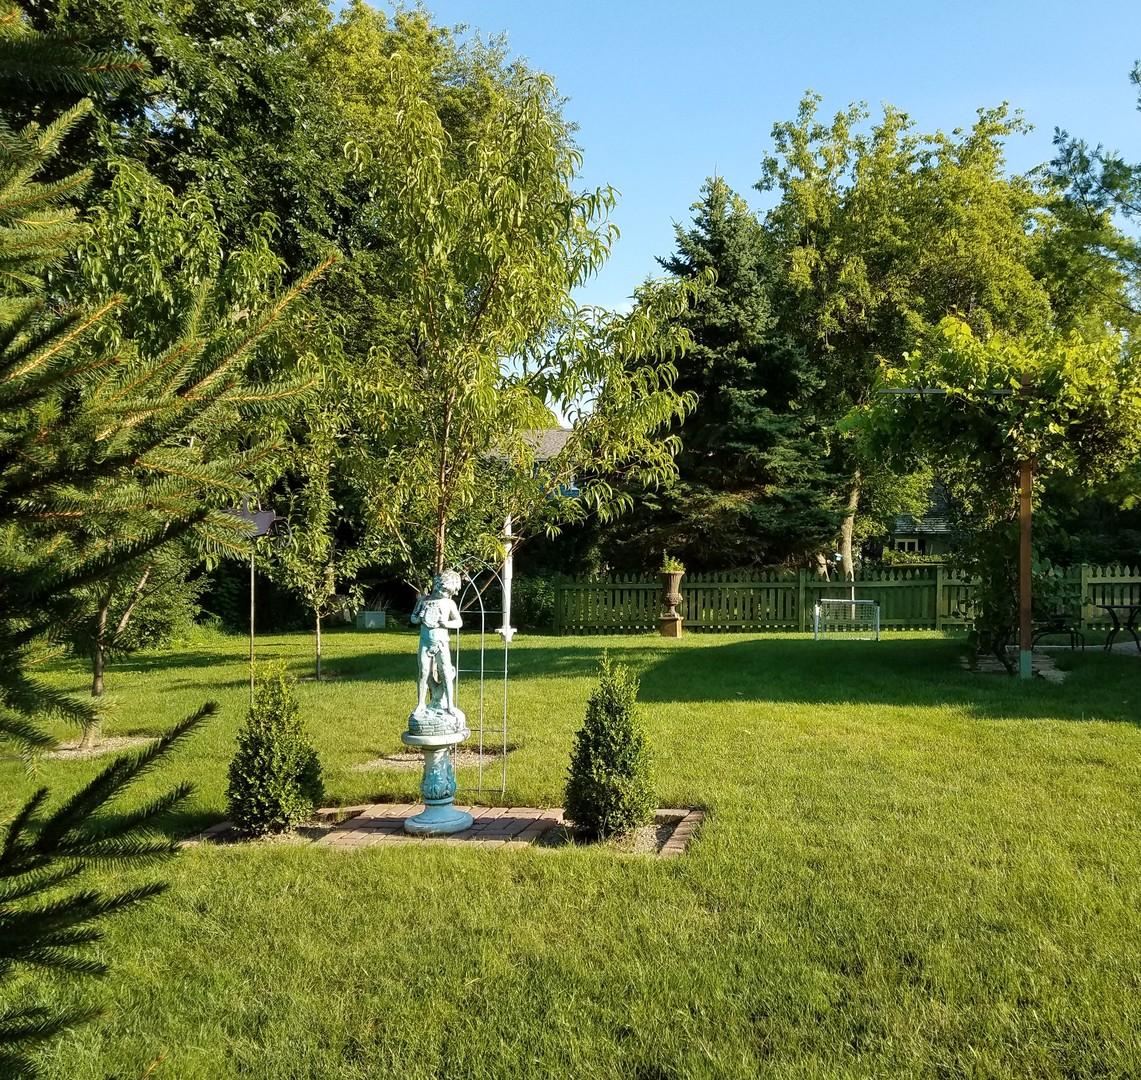 33521 North Ivy, Grayslake, Illinois, 60030